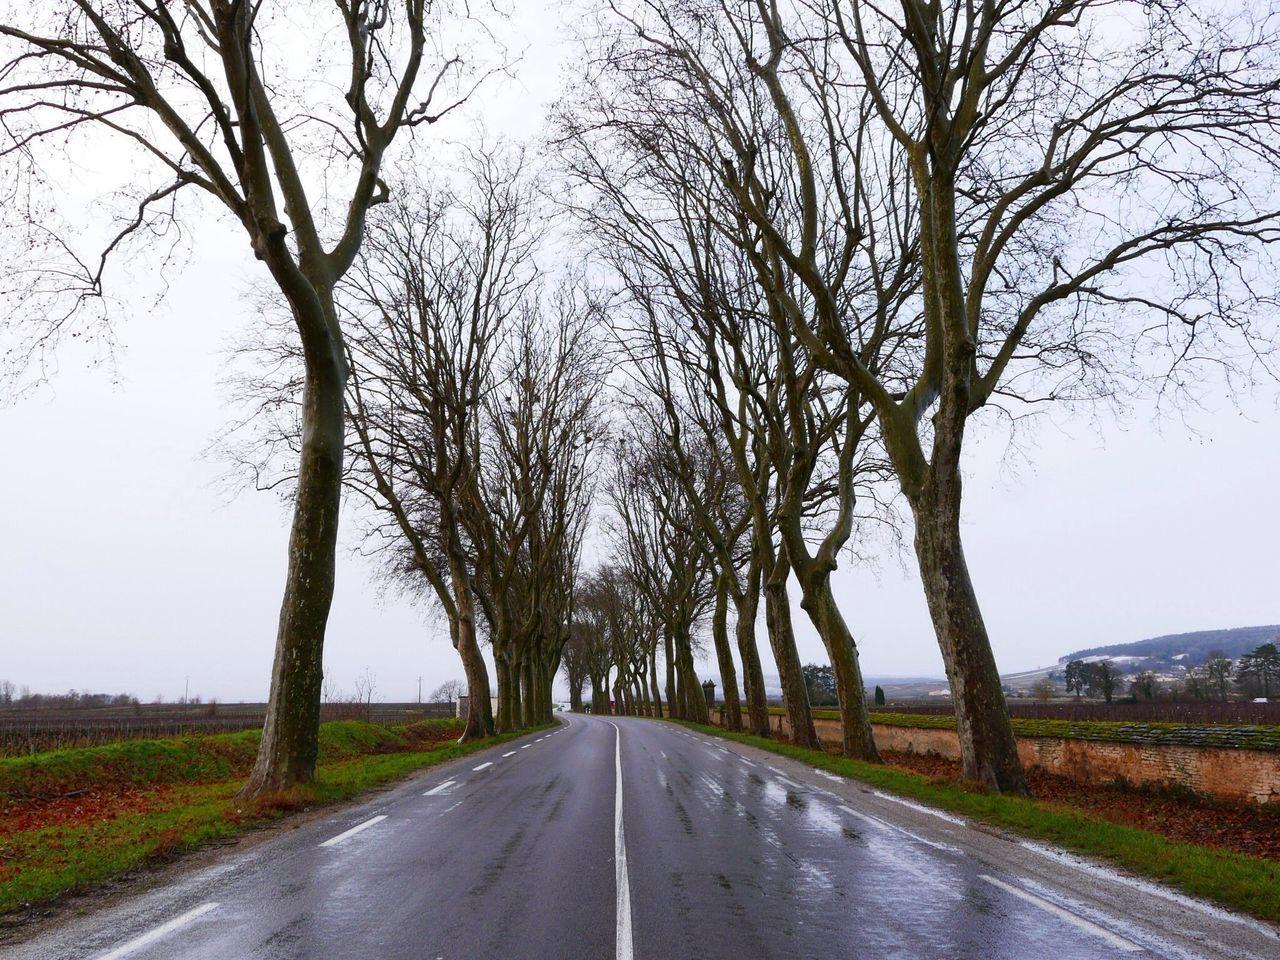 View Of Treelined Wet Asphalt Road